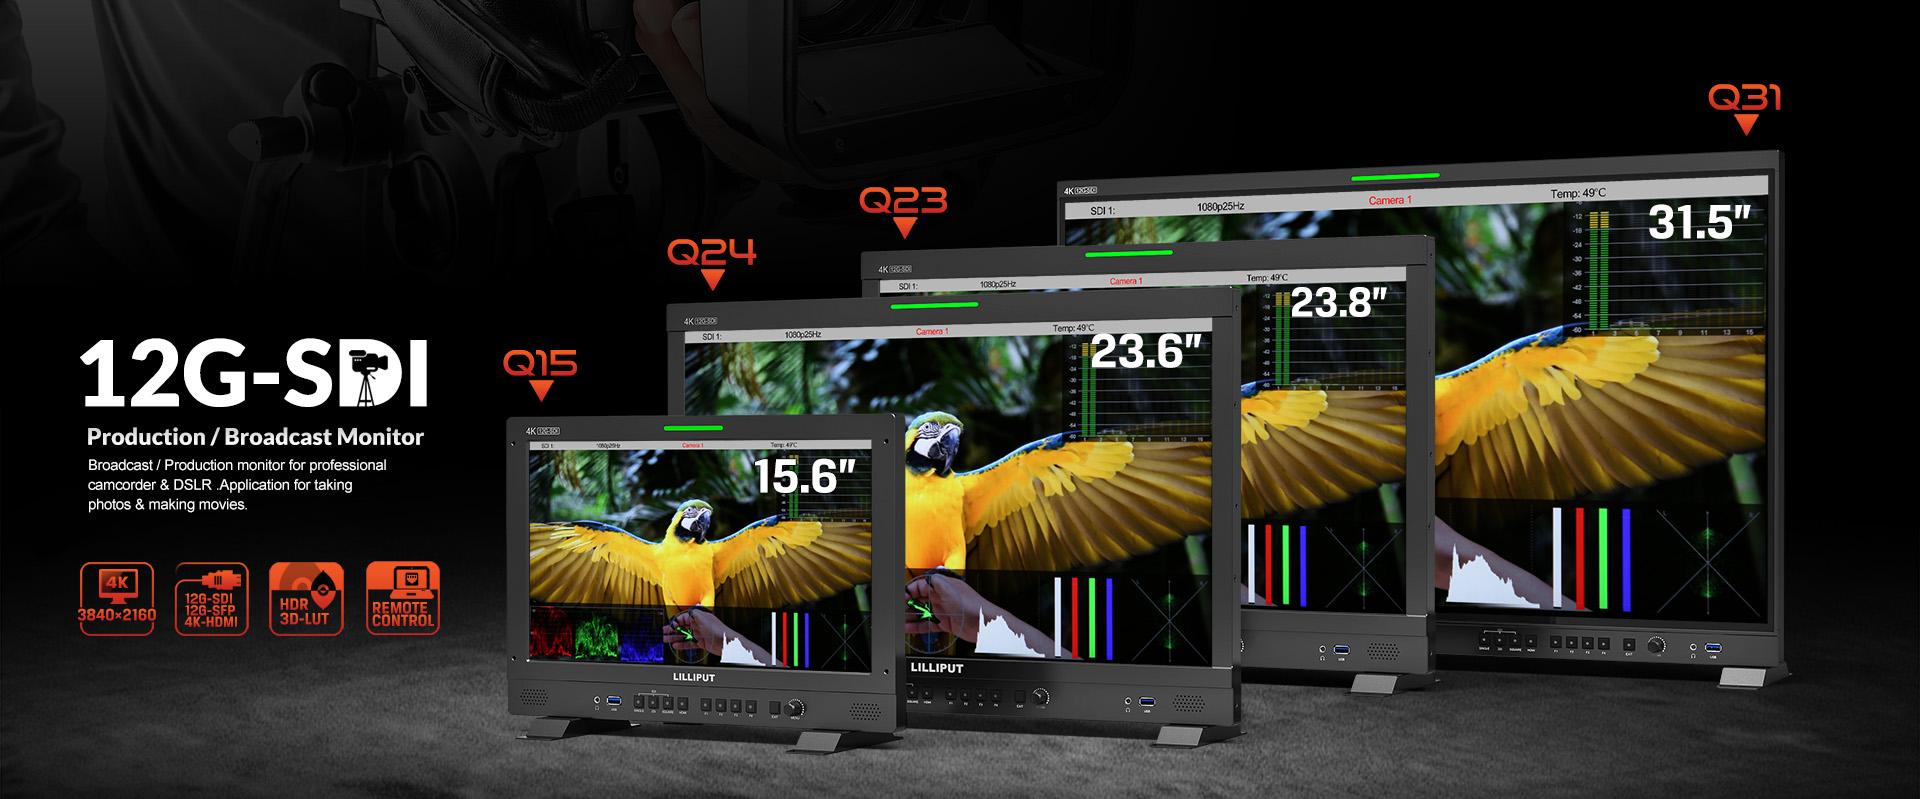 12G-SDI Production monitor